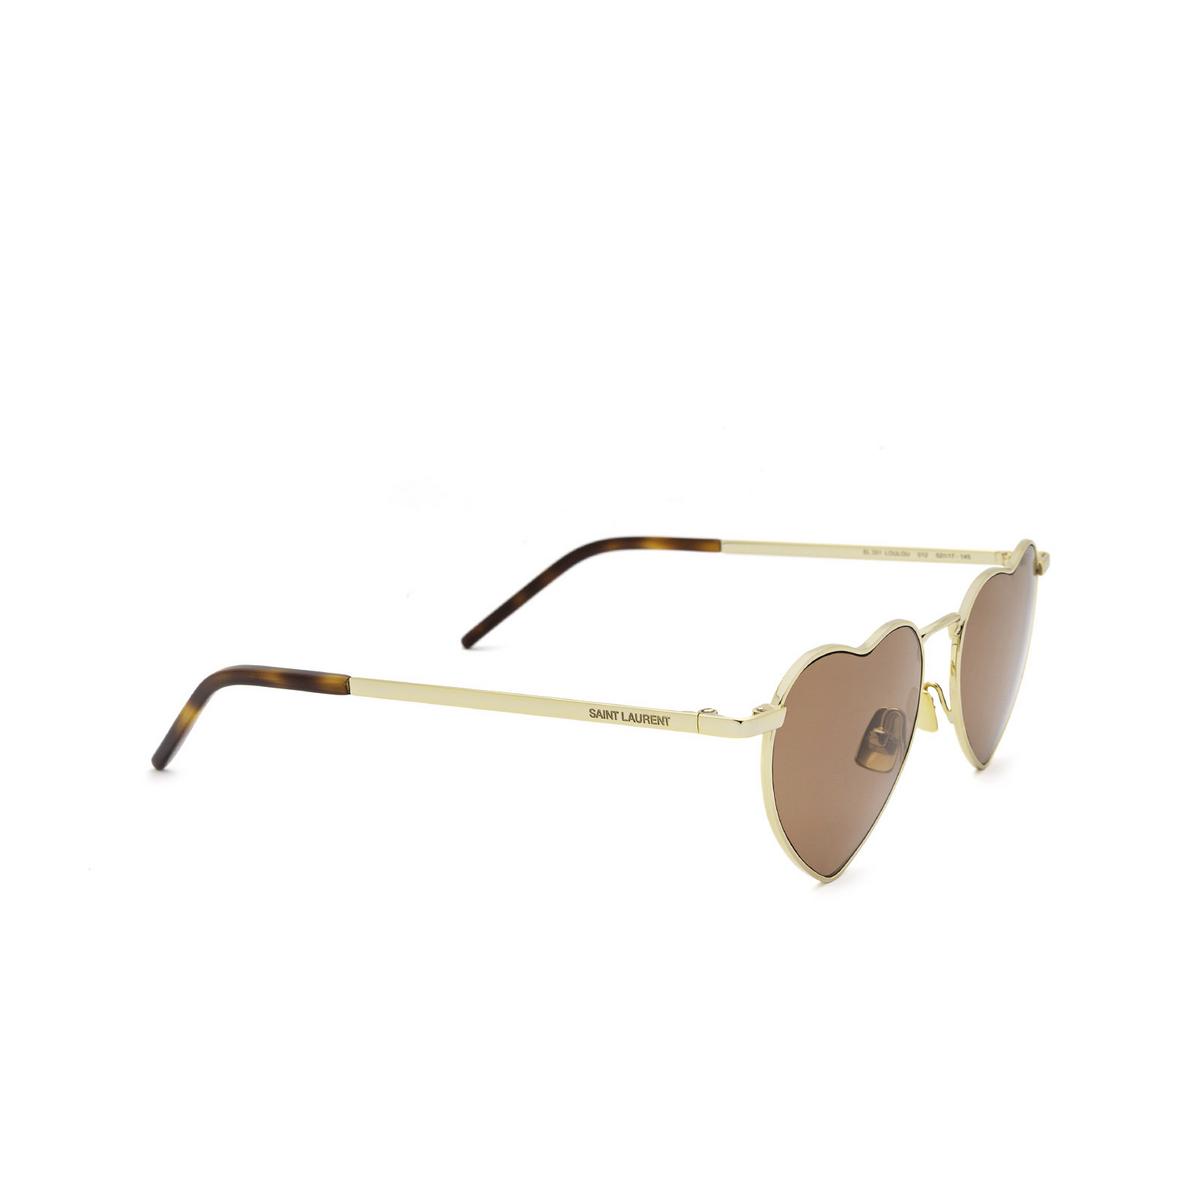 Saint Laurent® Irregular Sunglasses: Loulou SL 301 color Gold 012 - three-quarters view.